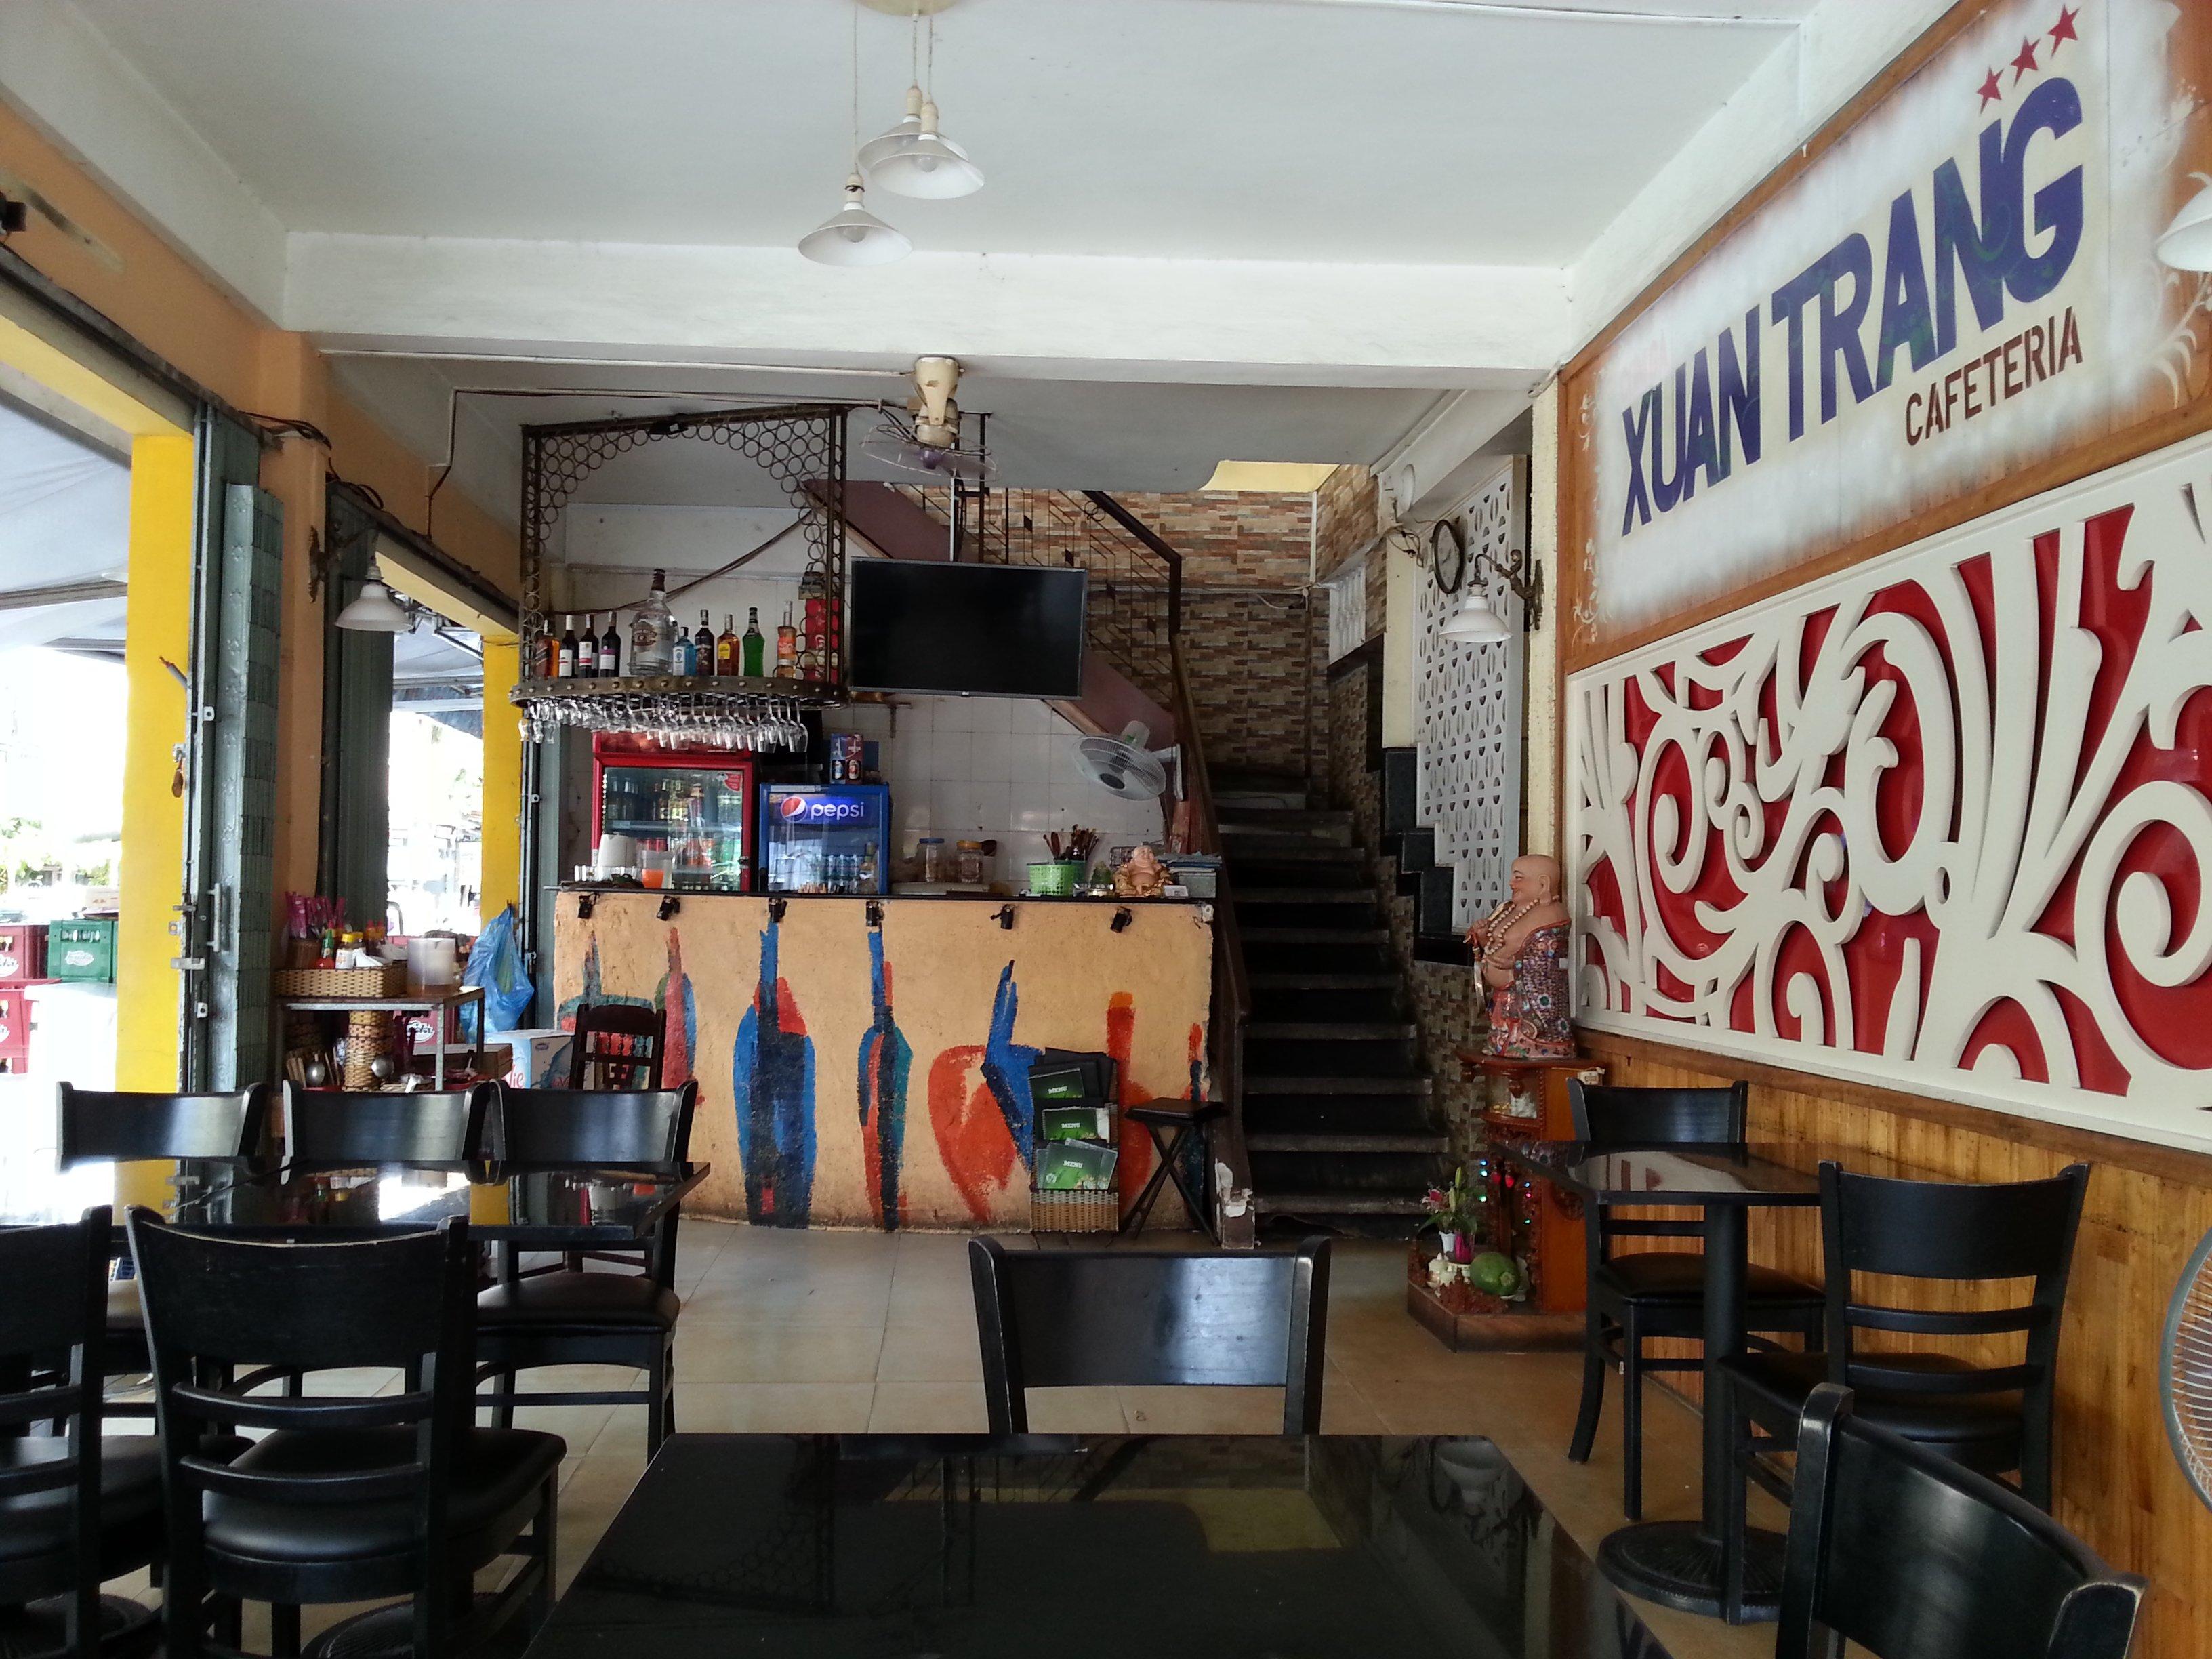 Inside Xuan Trang Restaurant